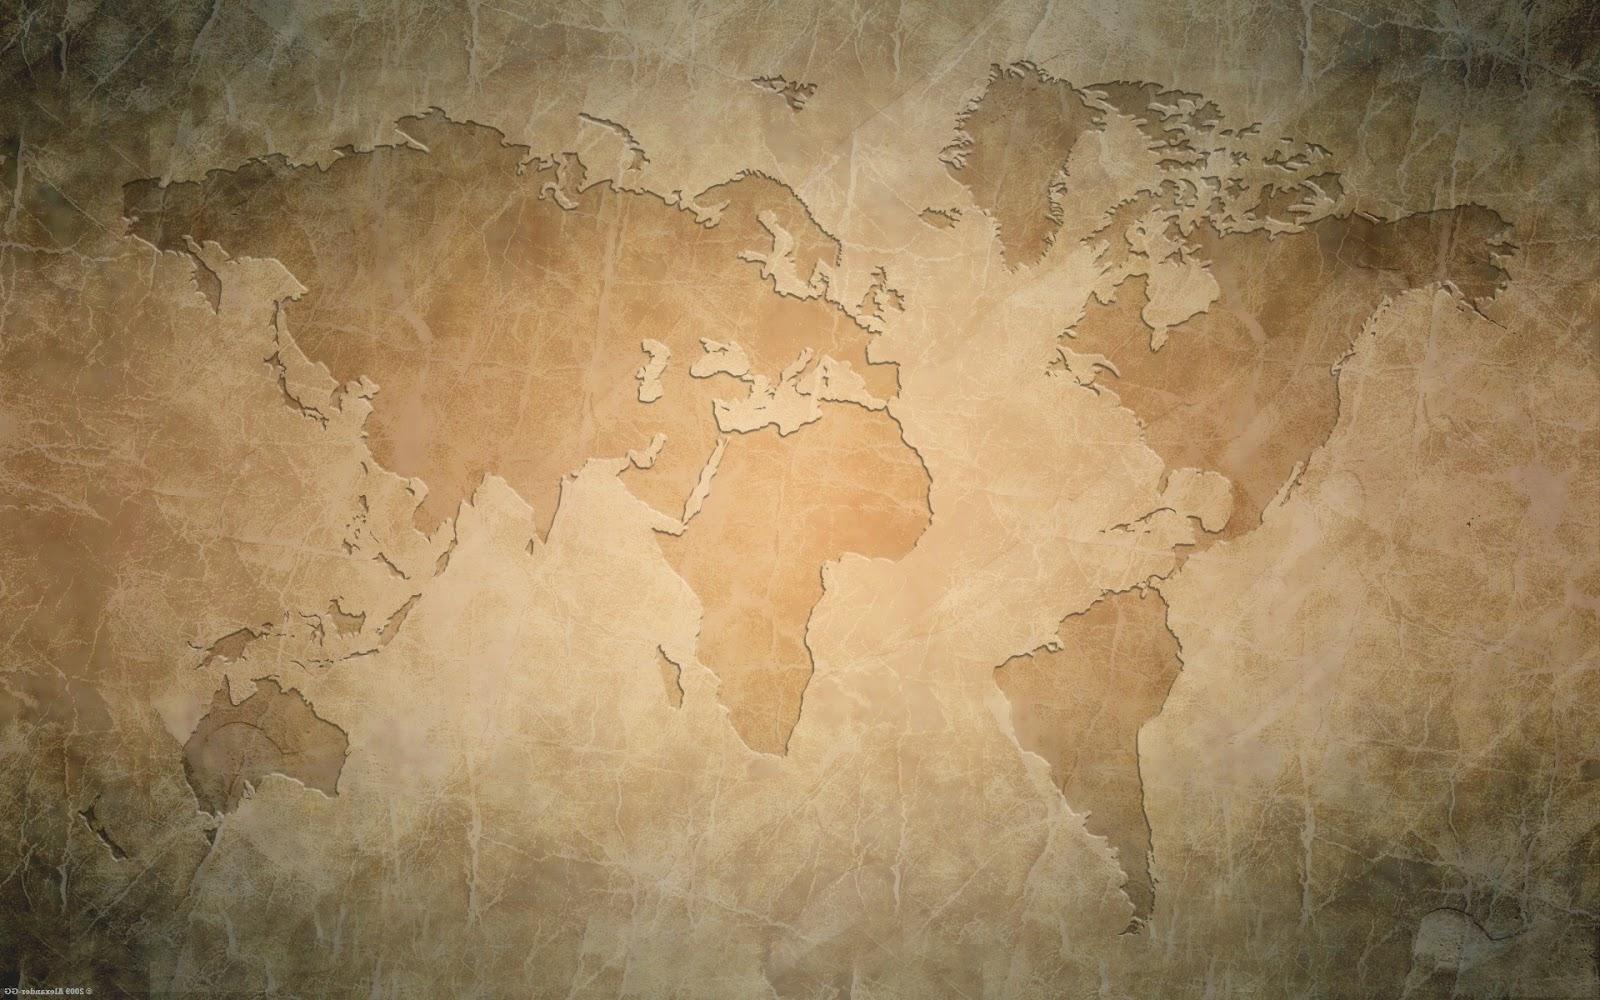 http://1.bp.blogspot.com/-xixdBH7cYw0/T4152LqS1aI/AAAAAAAADLk/MSXgQiG49Yk/s1600/textured-world-map-windows-8-wallpaper-1920x1200.jpg